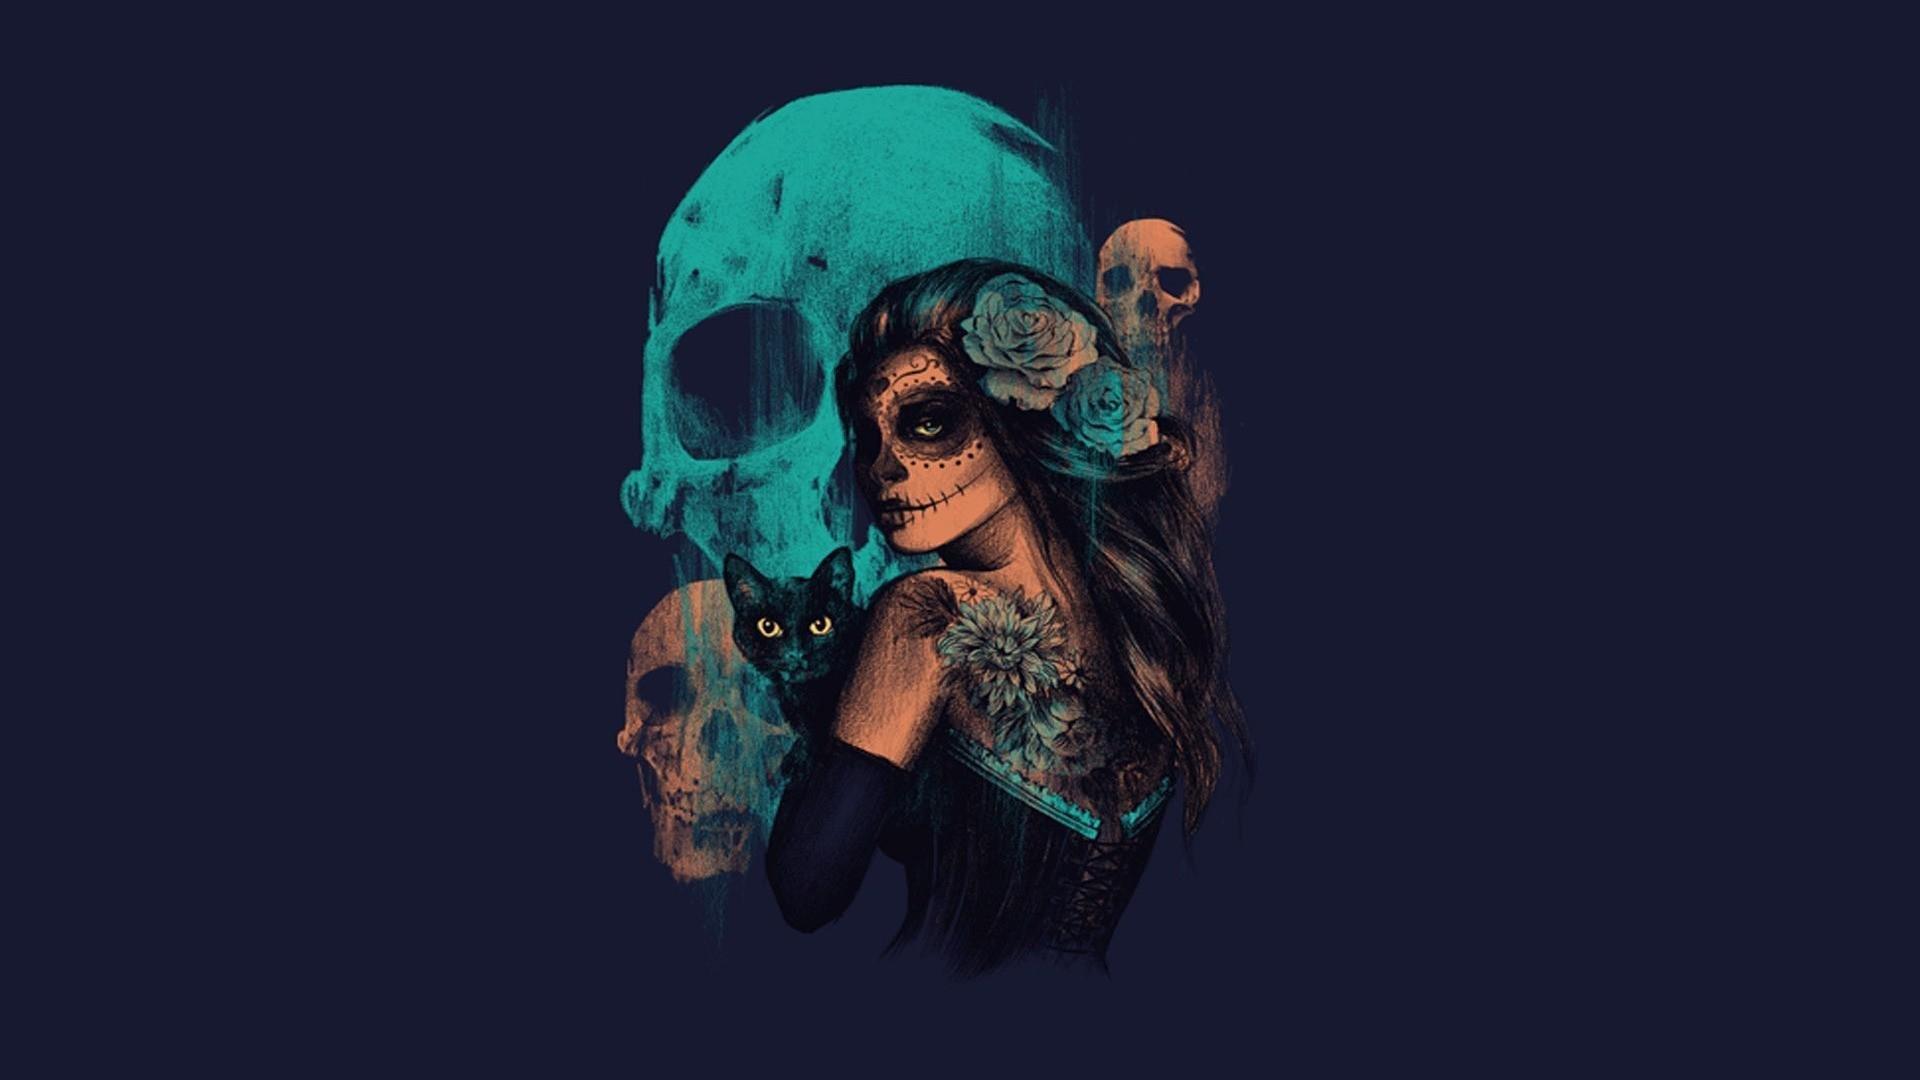 Sugar Skull Wallpapers Hd For Desktop Backgrounds